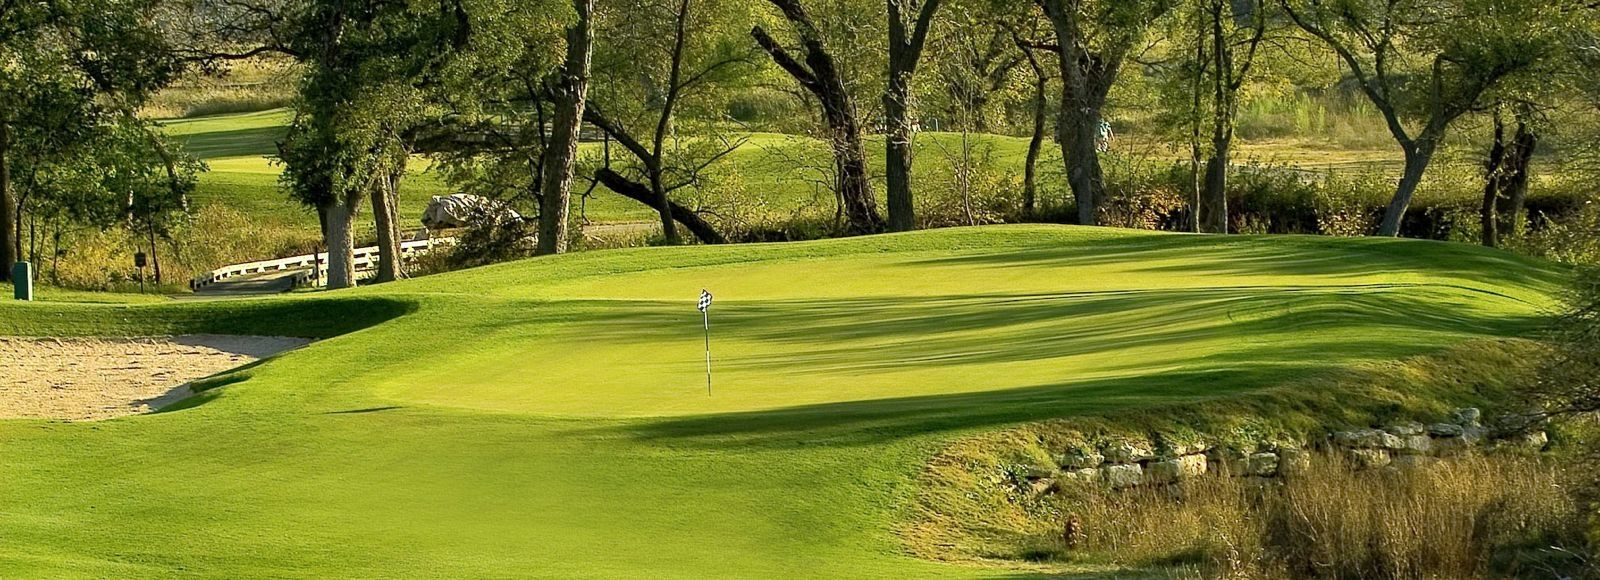 18++ Champions golf club texas viral